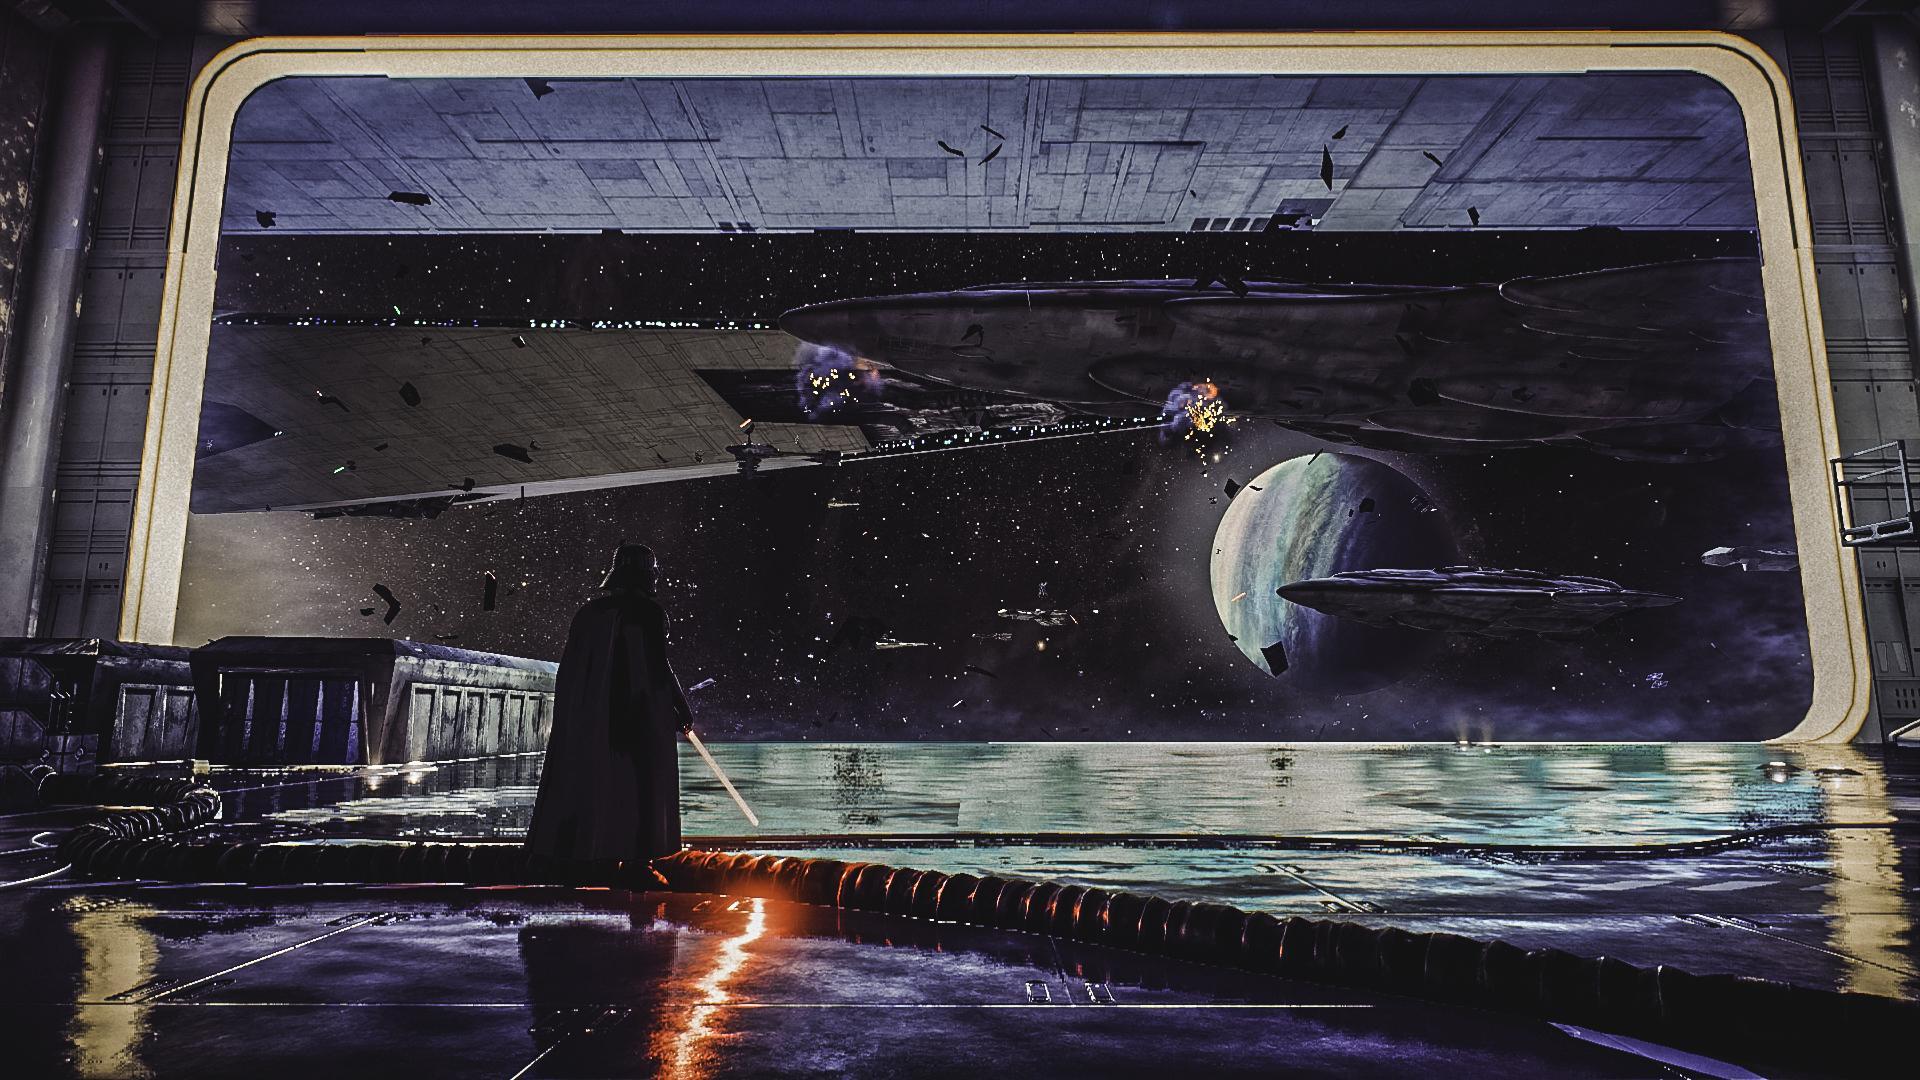 General 1920x1080 digital art artwork Star Wars Darth Vader movies destruction Star Wars Villains Imperial Forces Sith Star Wars Ships